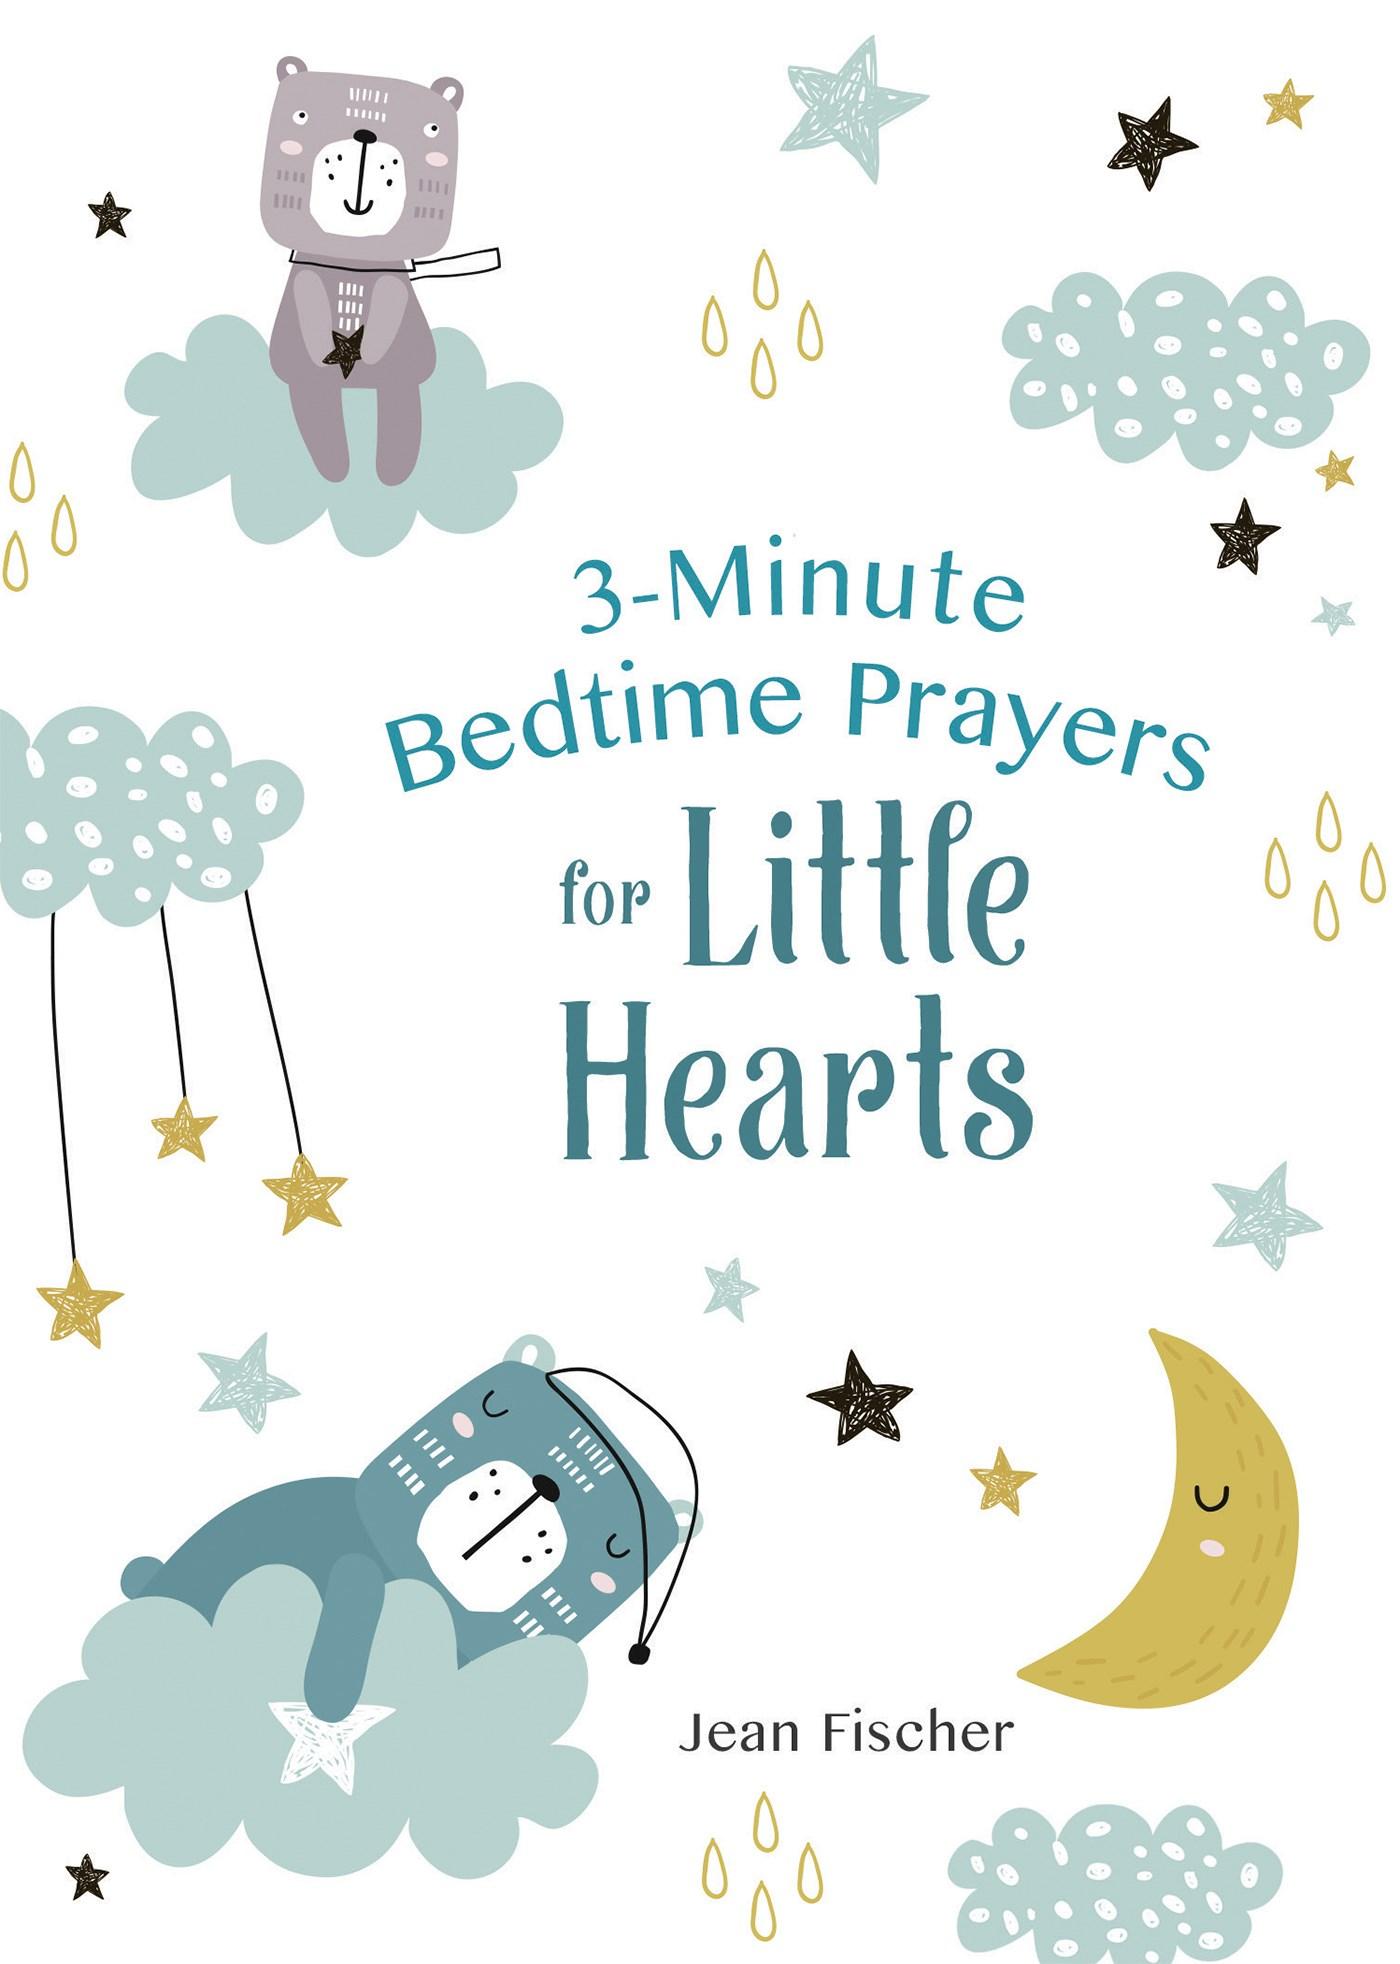 3-Minute Bedtime Prayers For Little Hearts